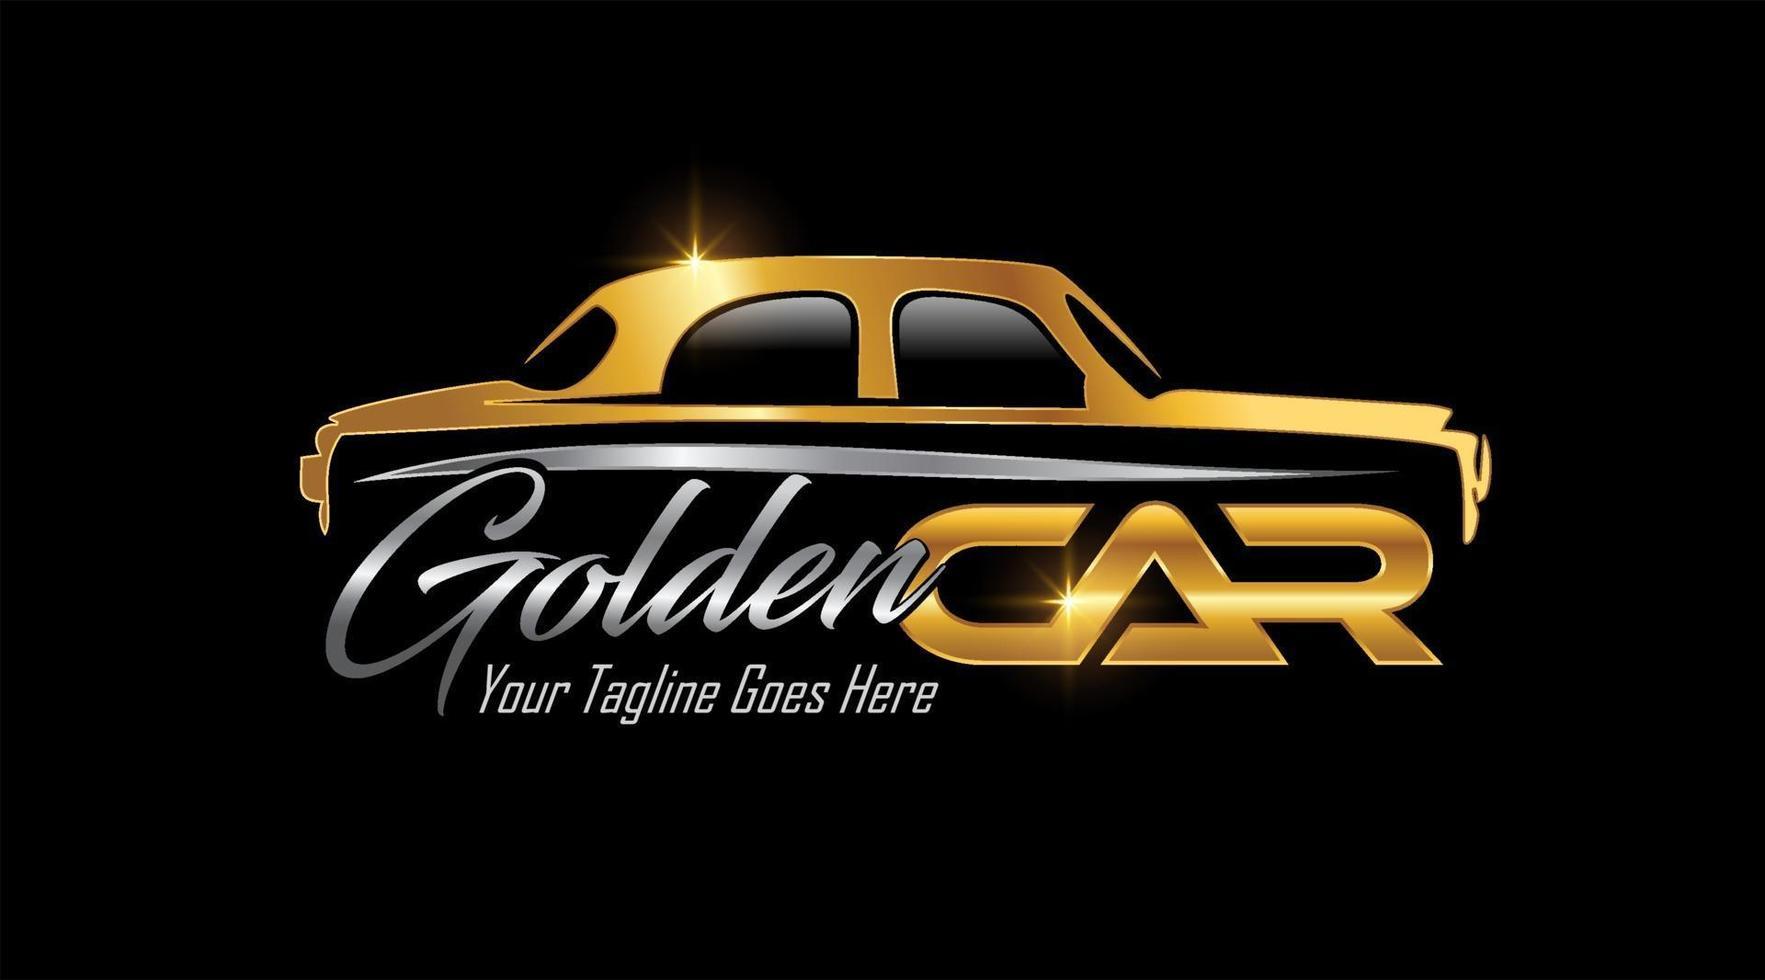 gouden oldtimer voertuig logo vector